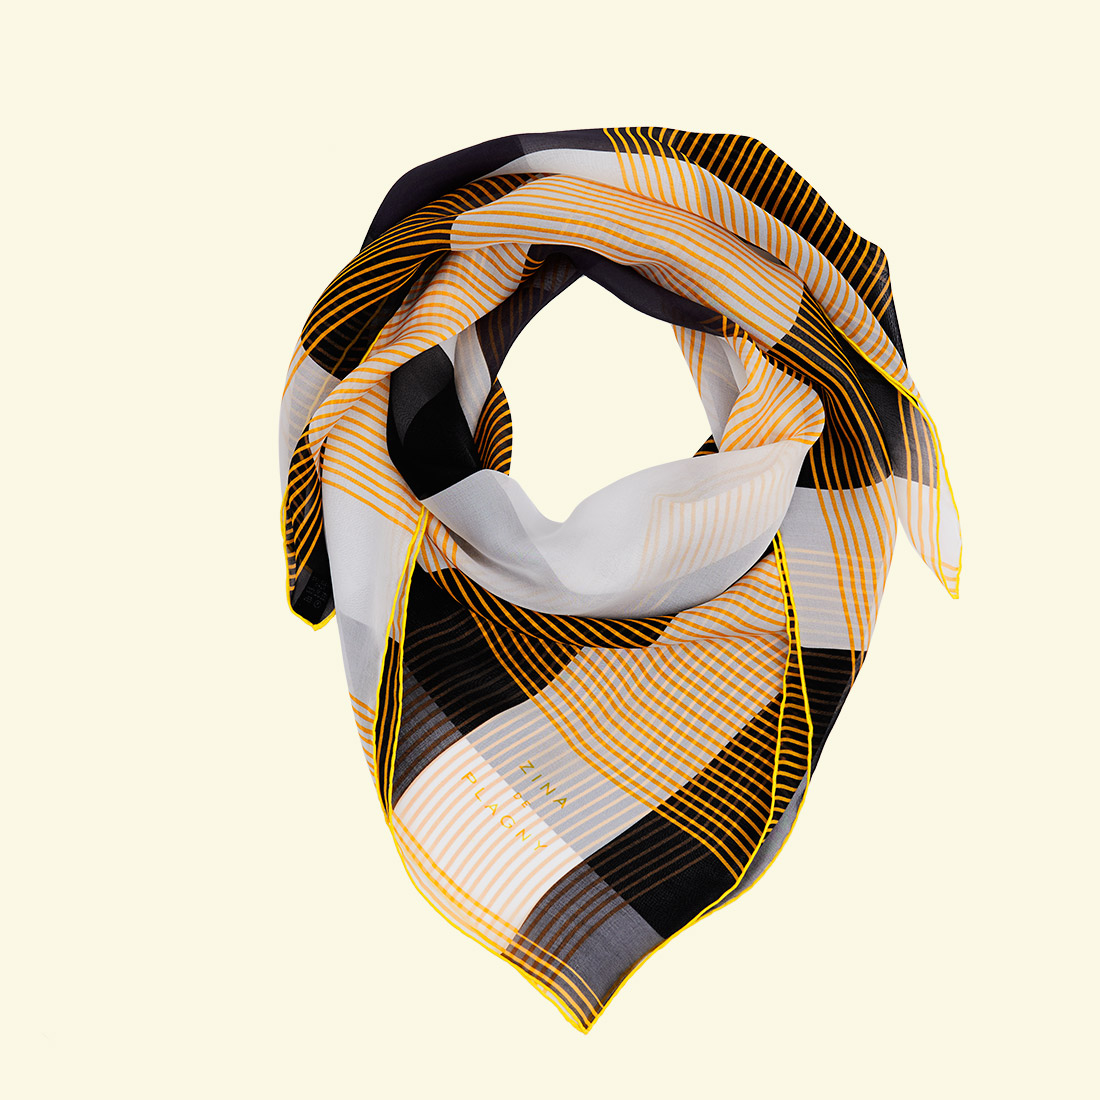 zina deplagny-scarf-silk-chiffon-yellow-tartan